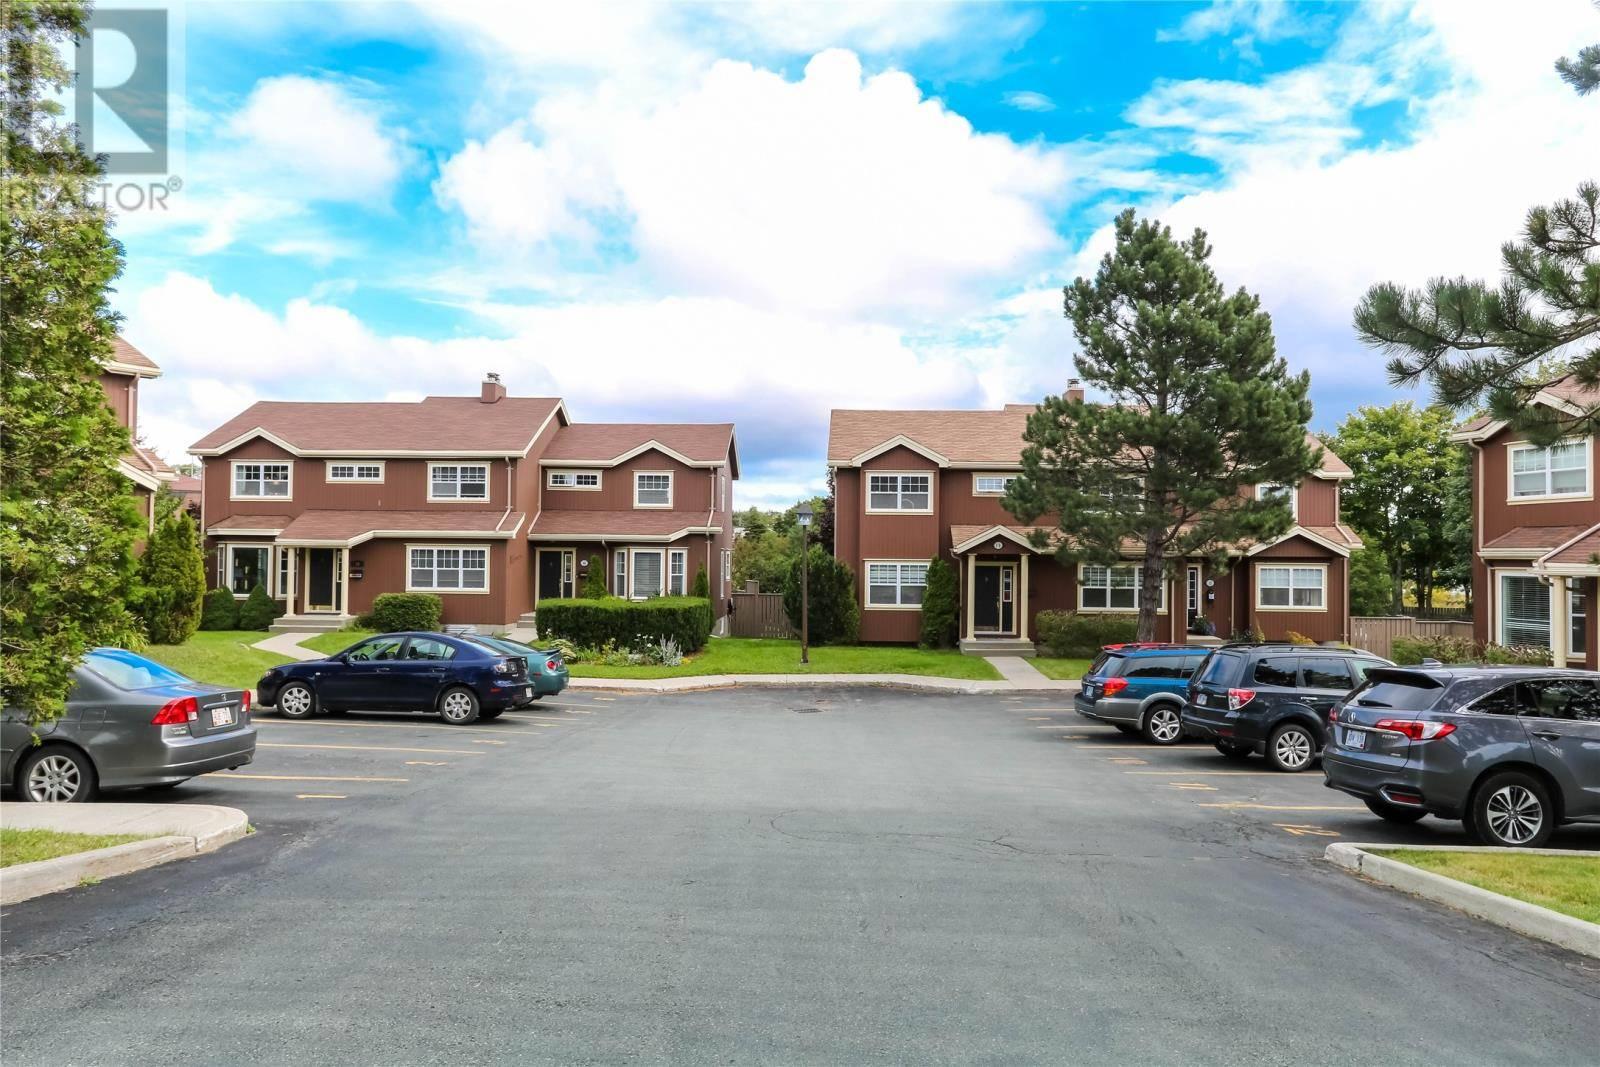 House for sale at 16 Tiffany Ln St. John's Newfoundland - MLS: 1209521